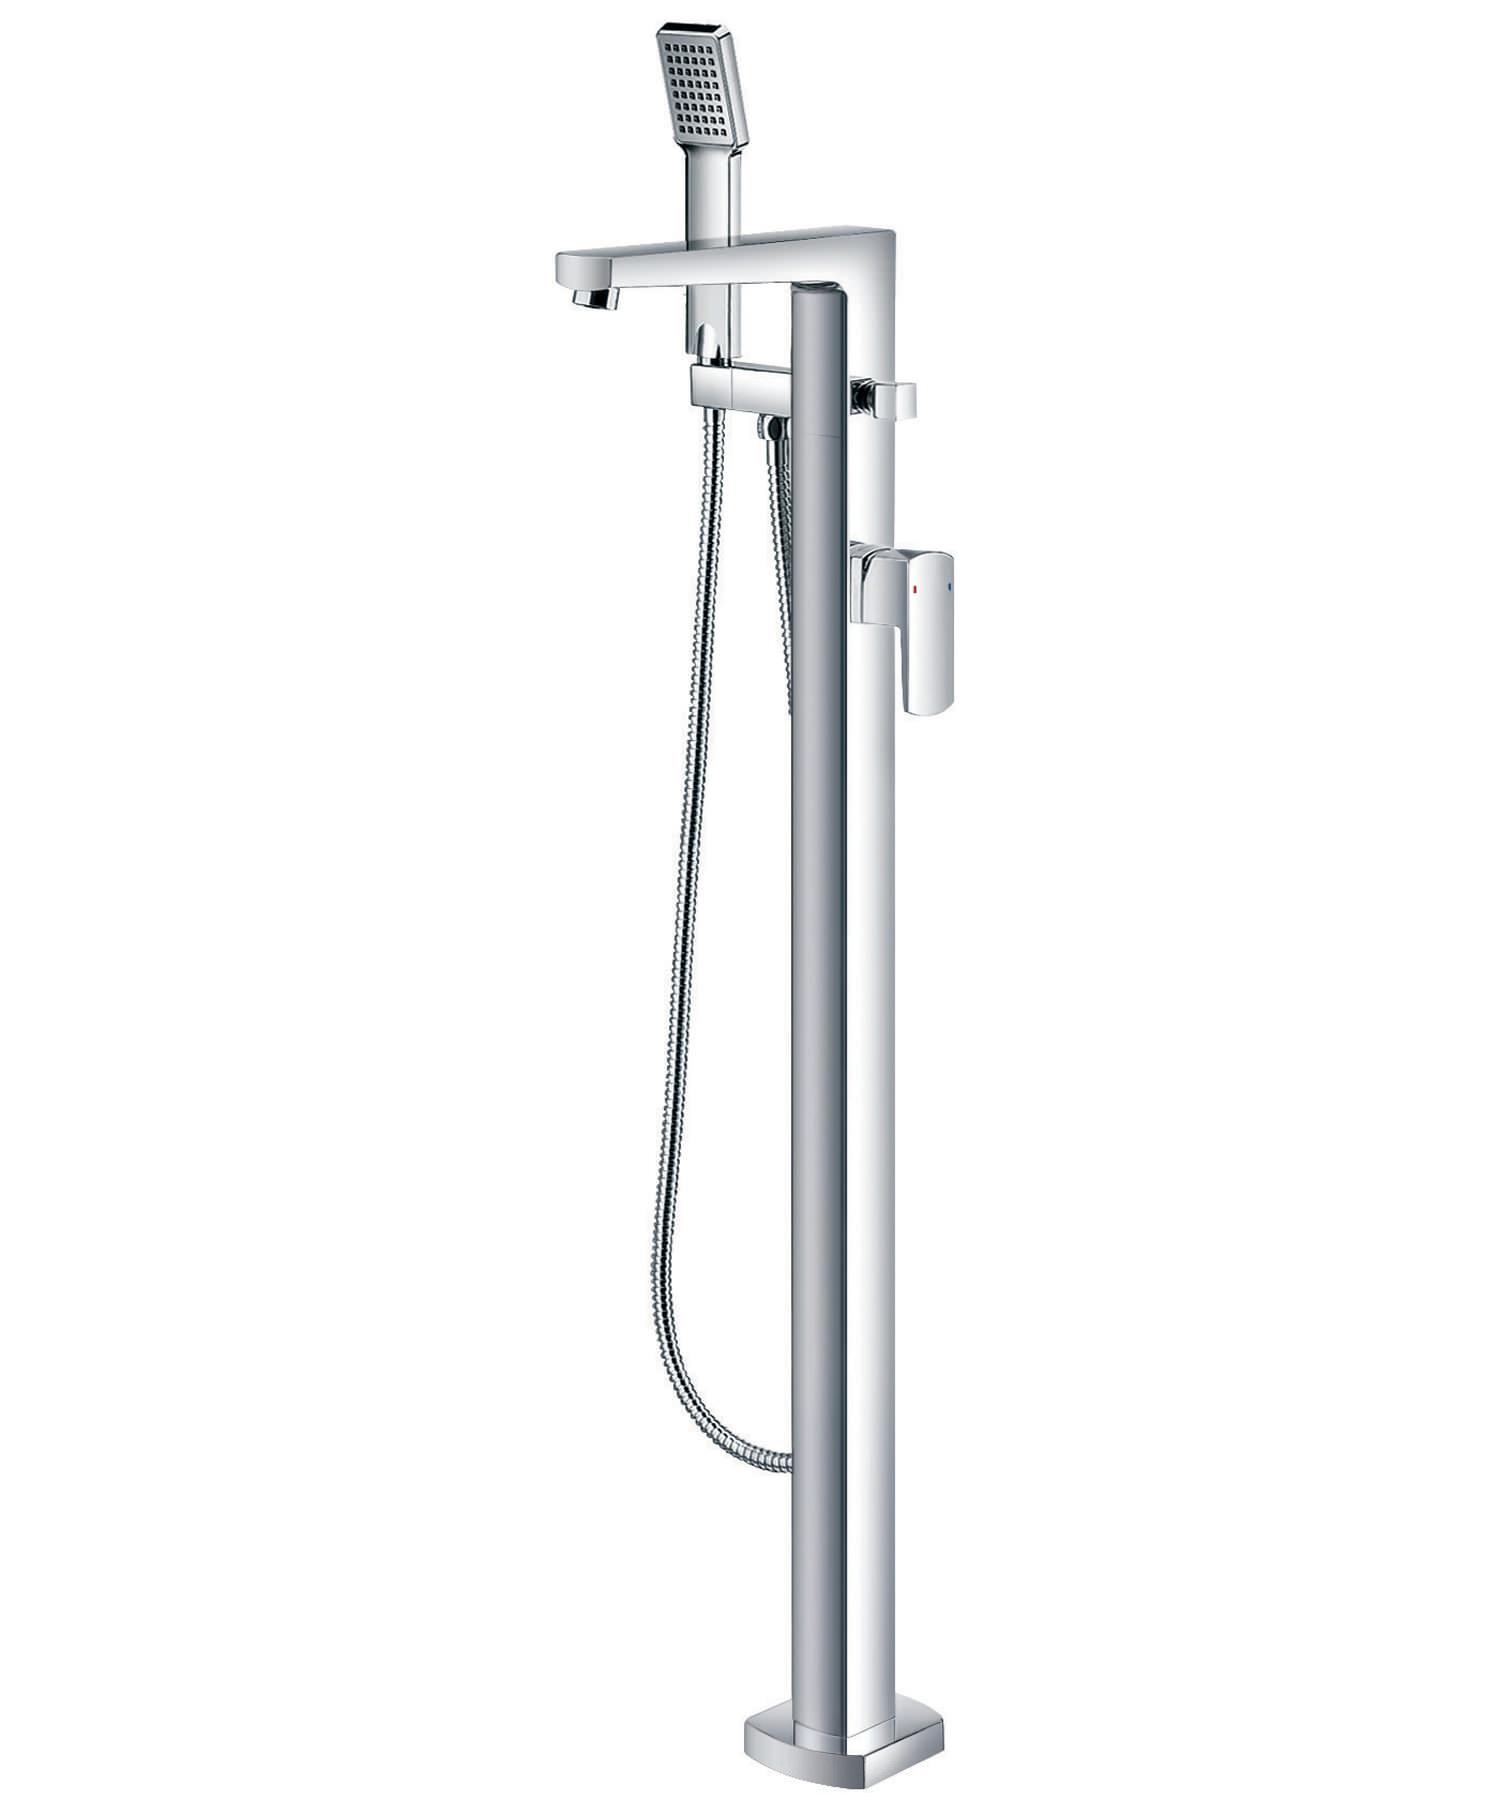 flova dekka floor mounted bath shower mixer tap with handset. Black Bedroom Furniture Sets. Home Design Ideas